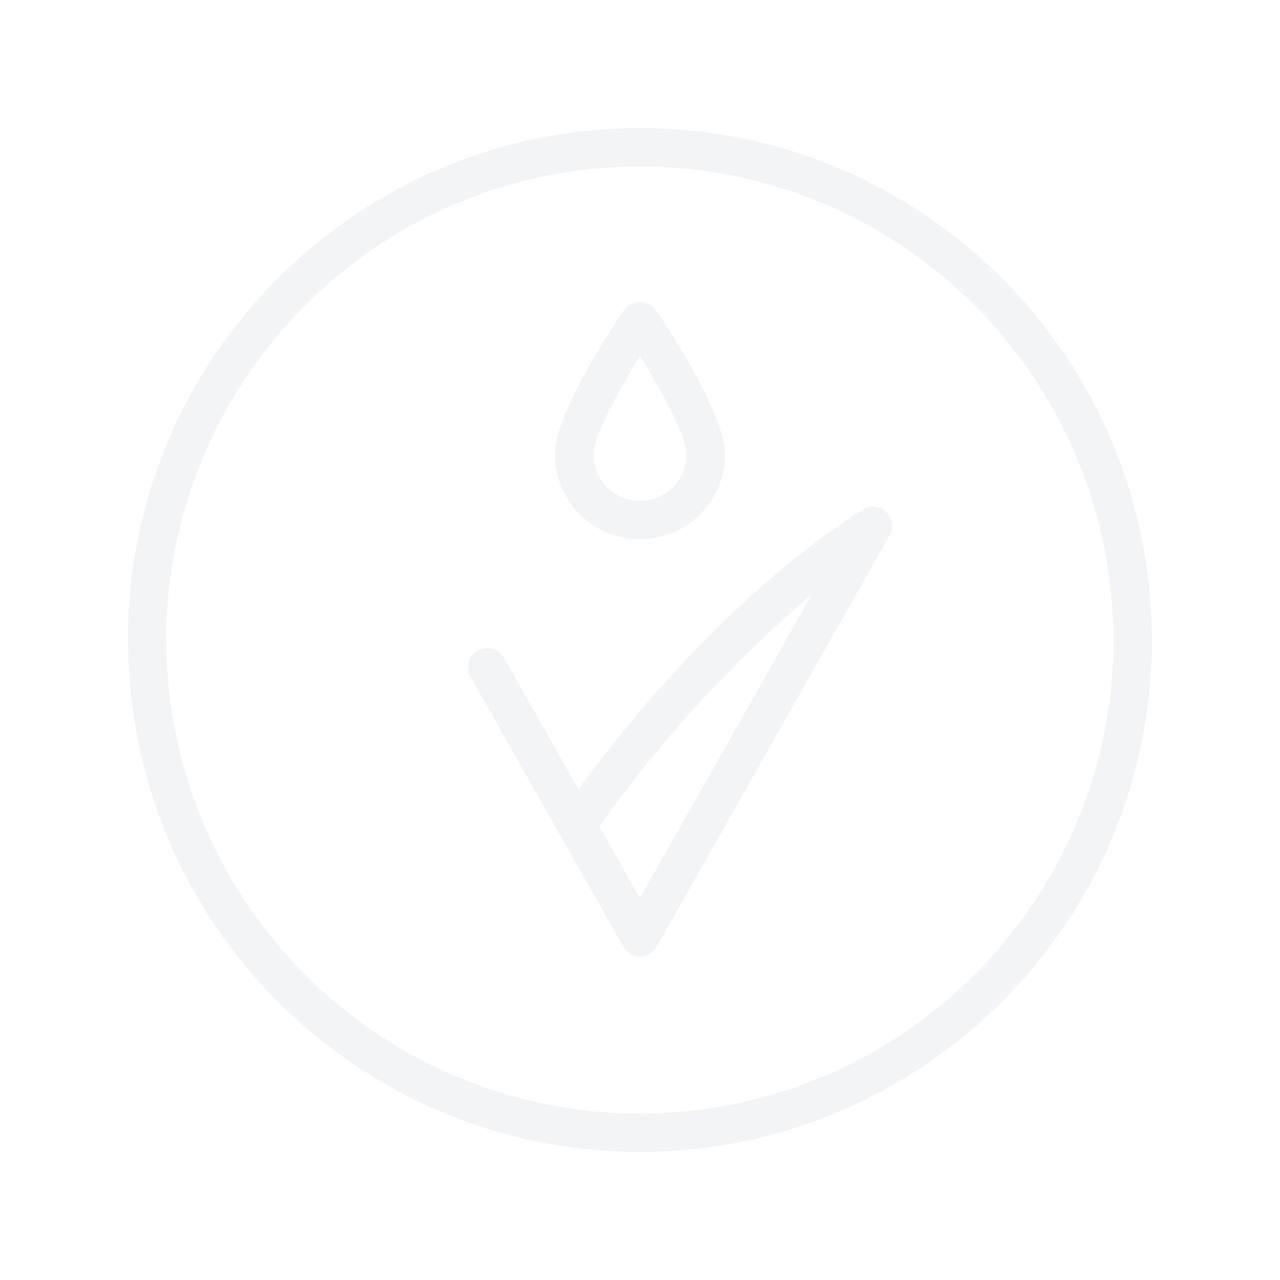 Dior Nail Glow Whitening Care 10ml